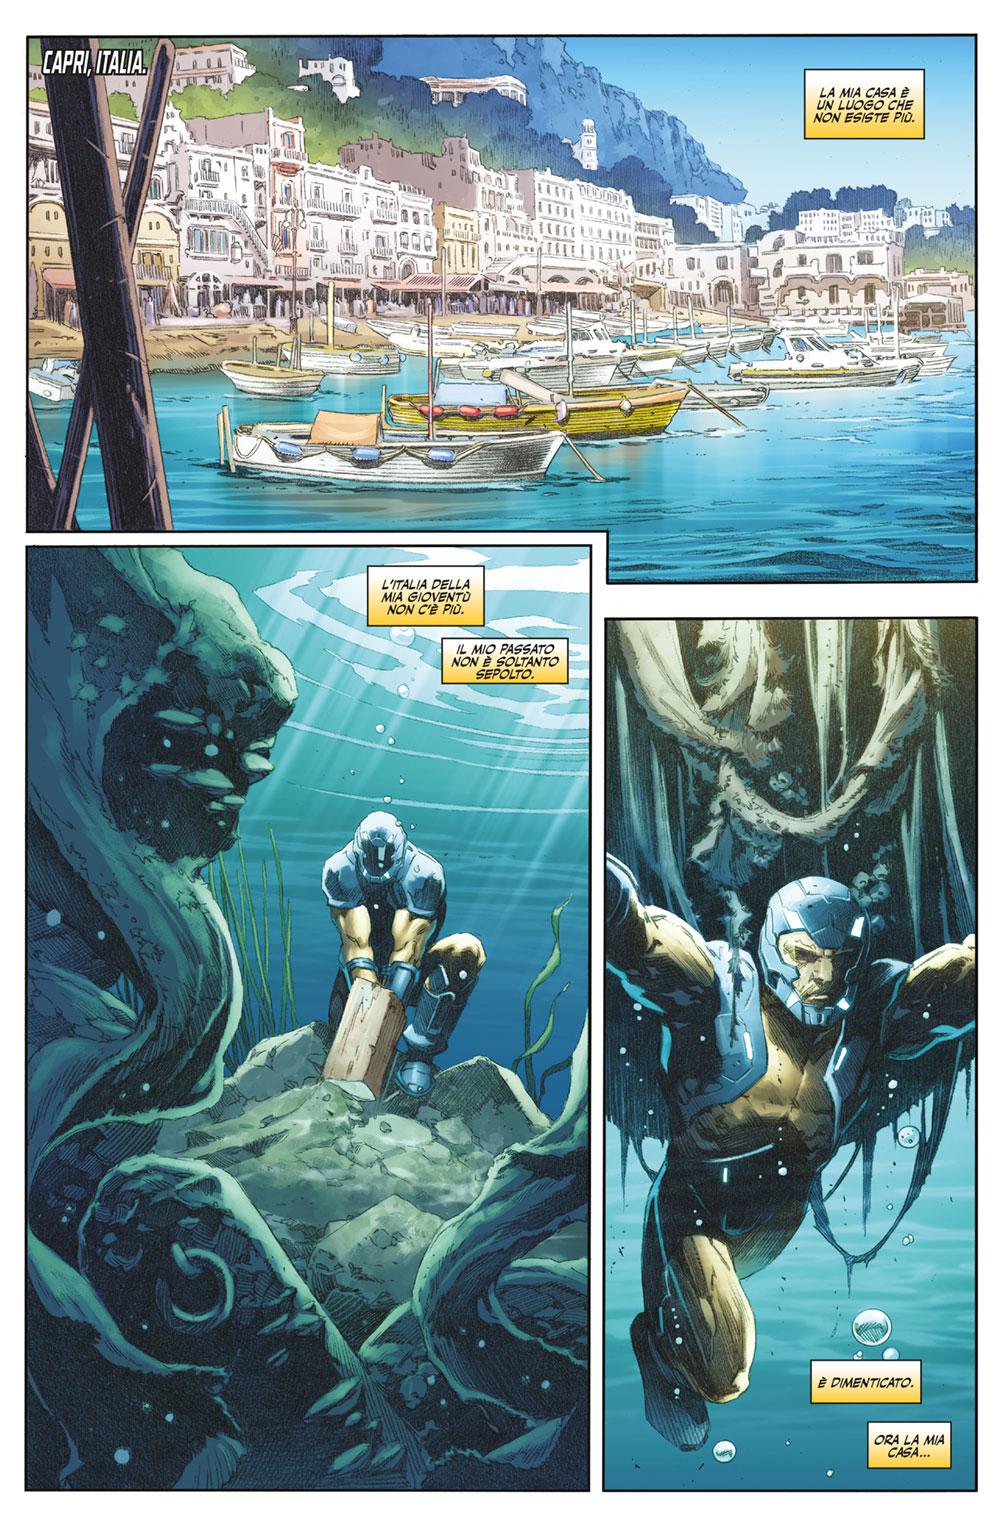 X-O Manowar vol. 7: Eroe, anteprima 03